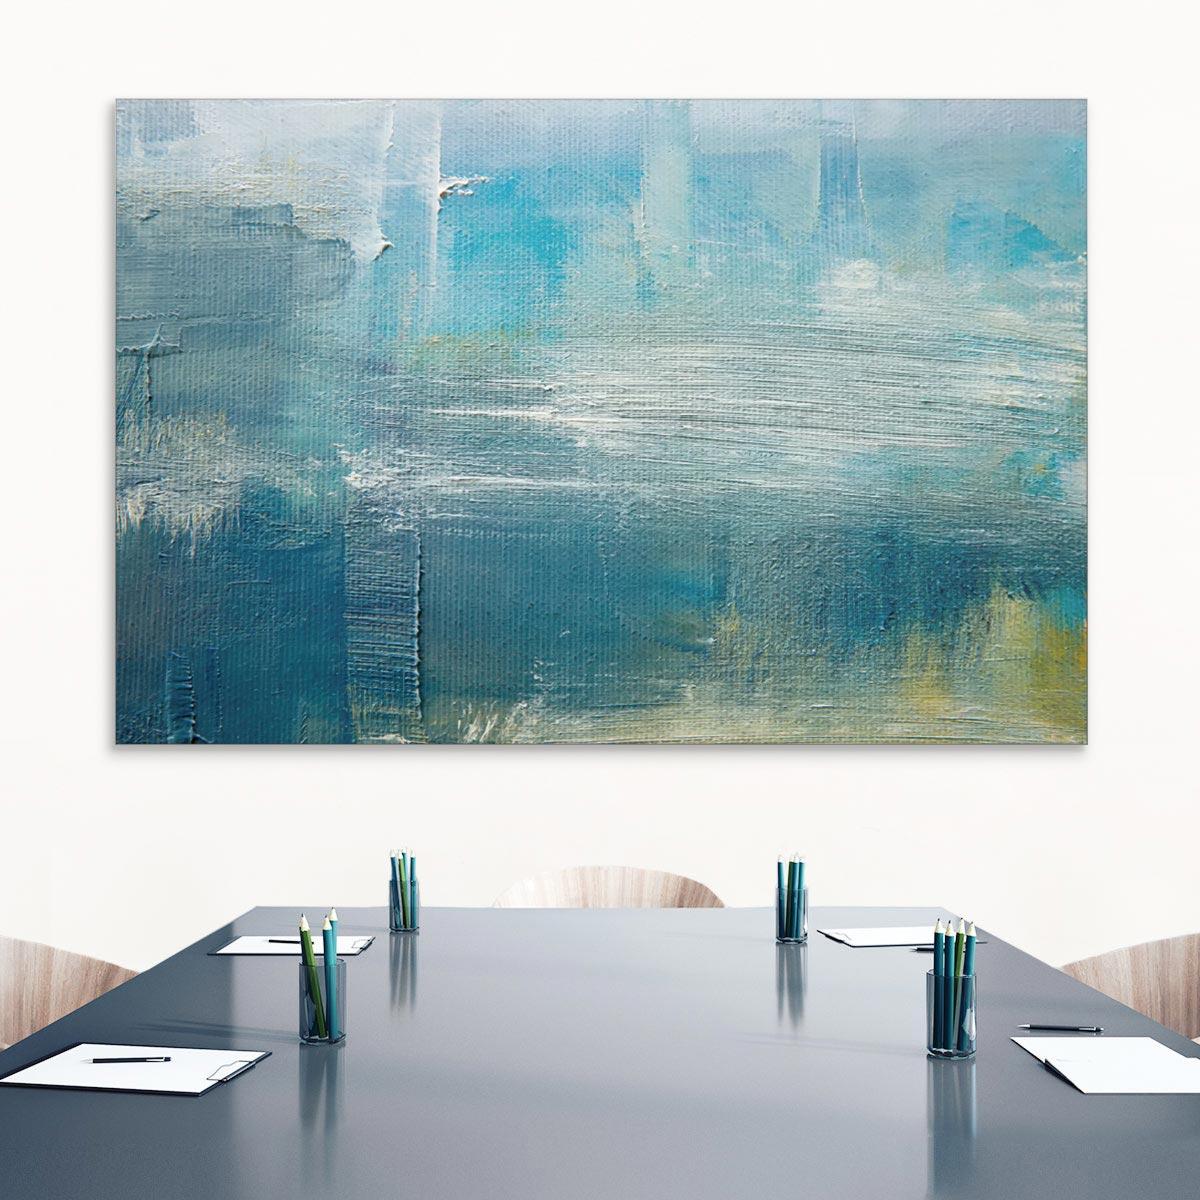 Akustikbild Acrylkomposition in Blau